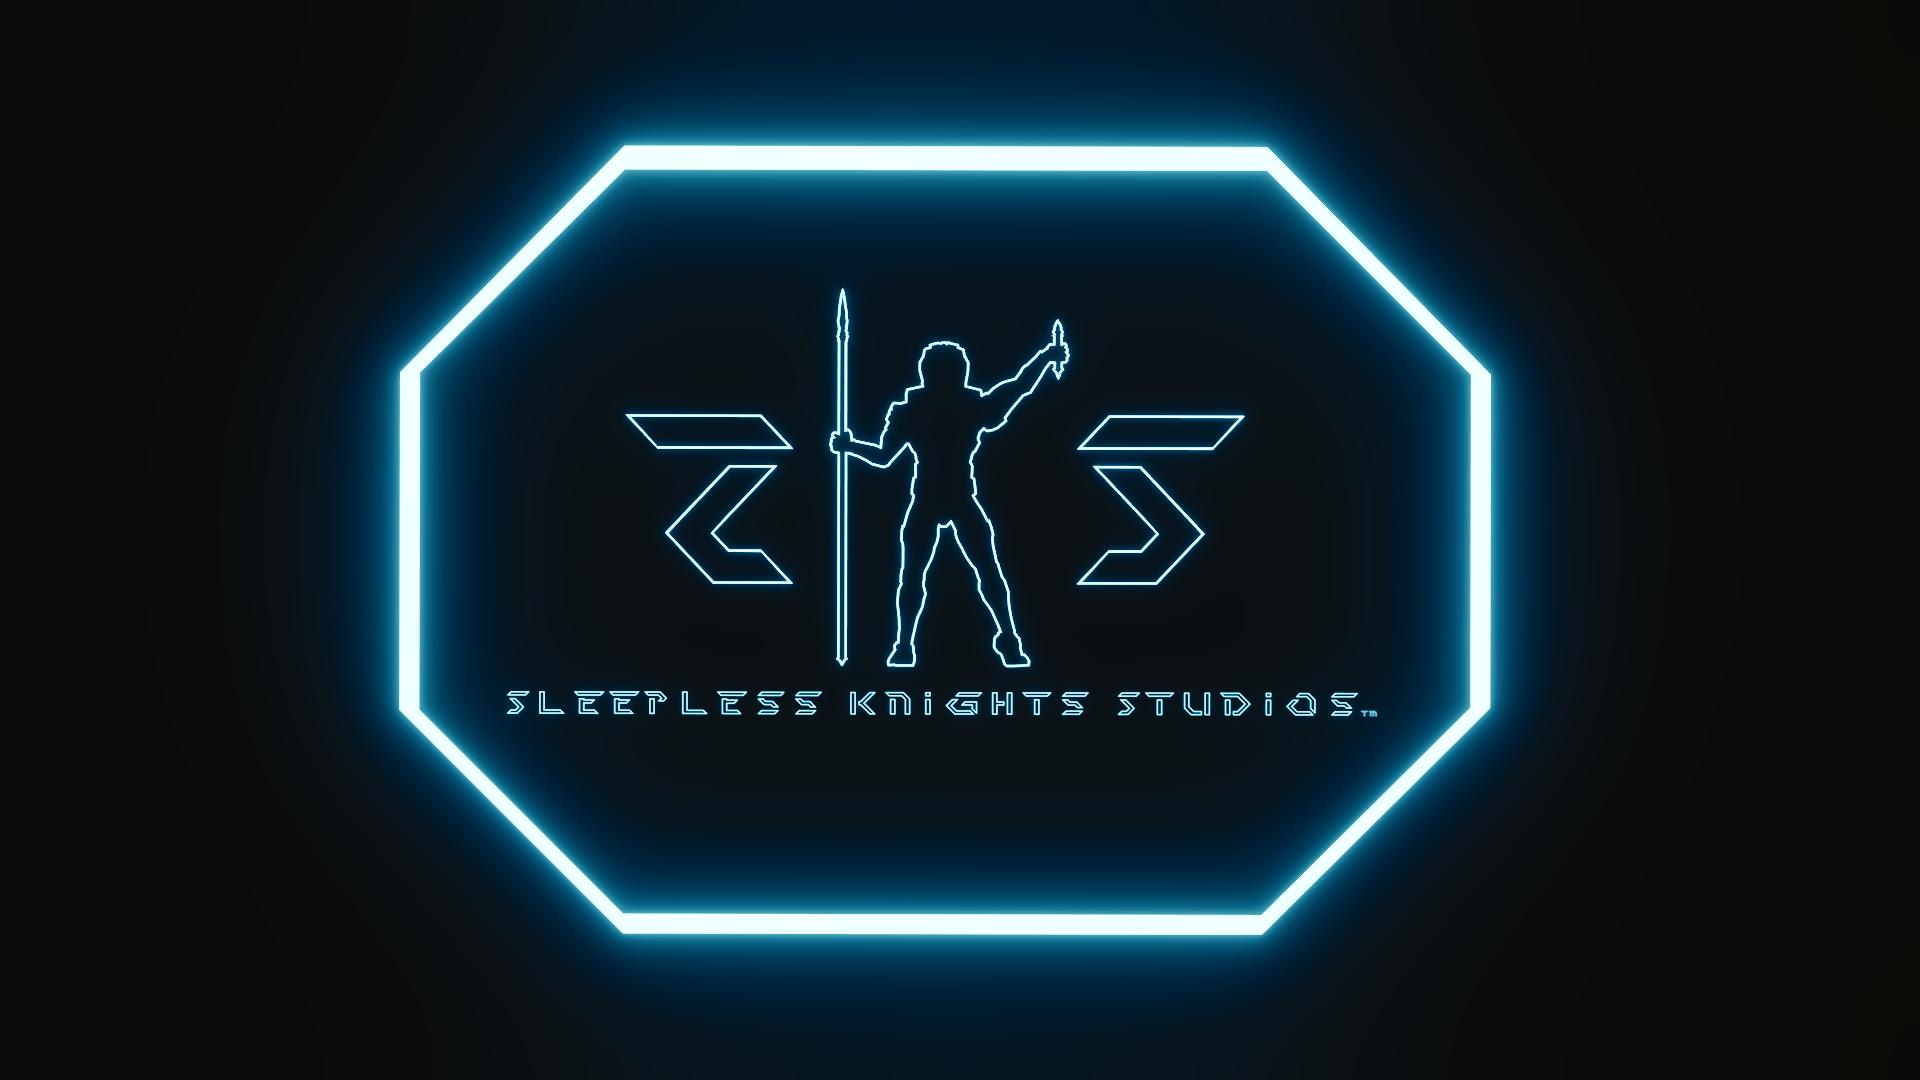 Steam Workshop Sks Space Engineers Inspiration Series